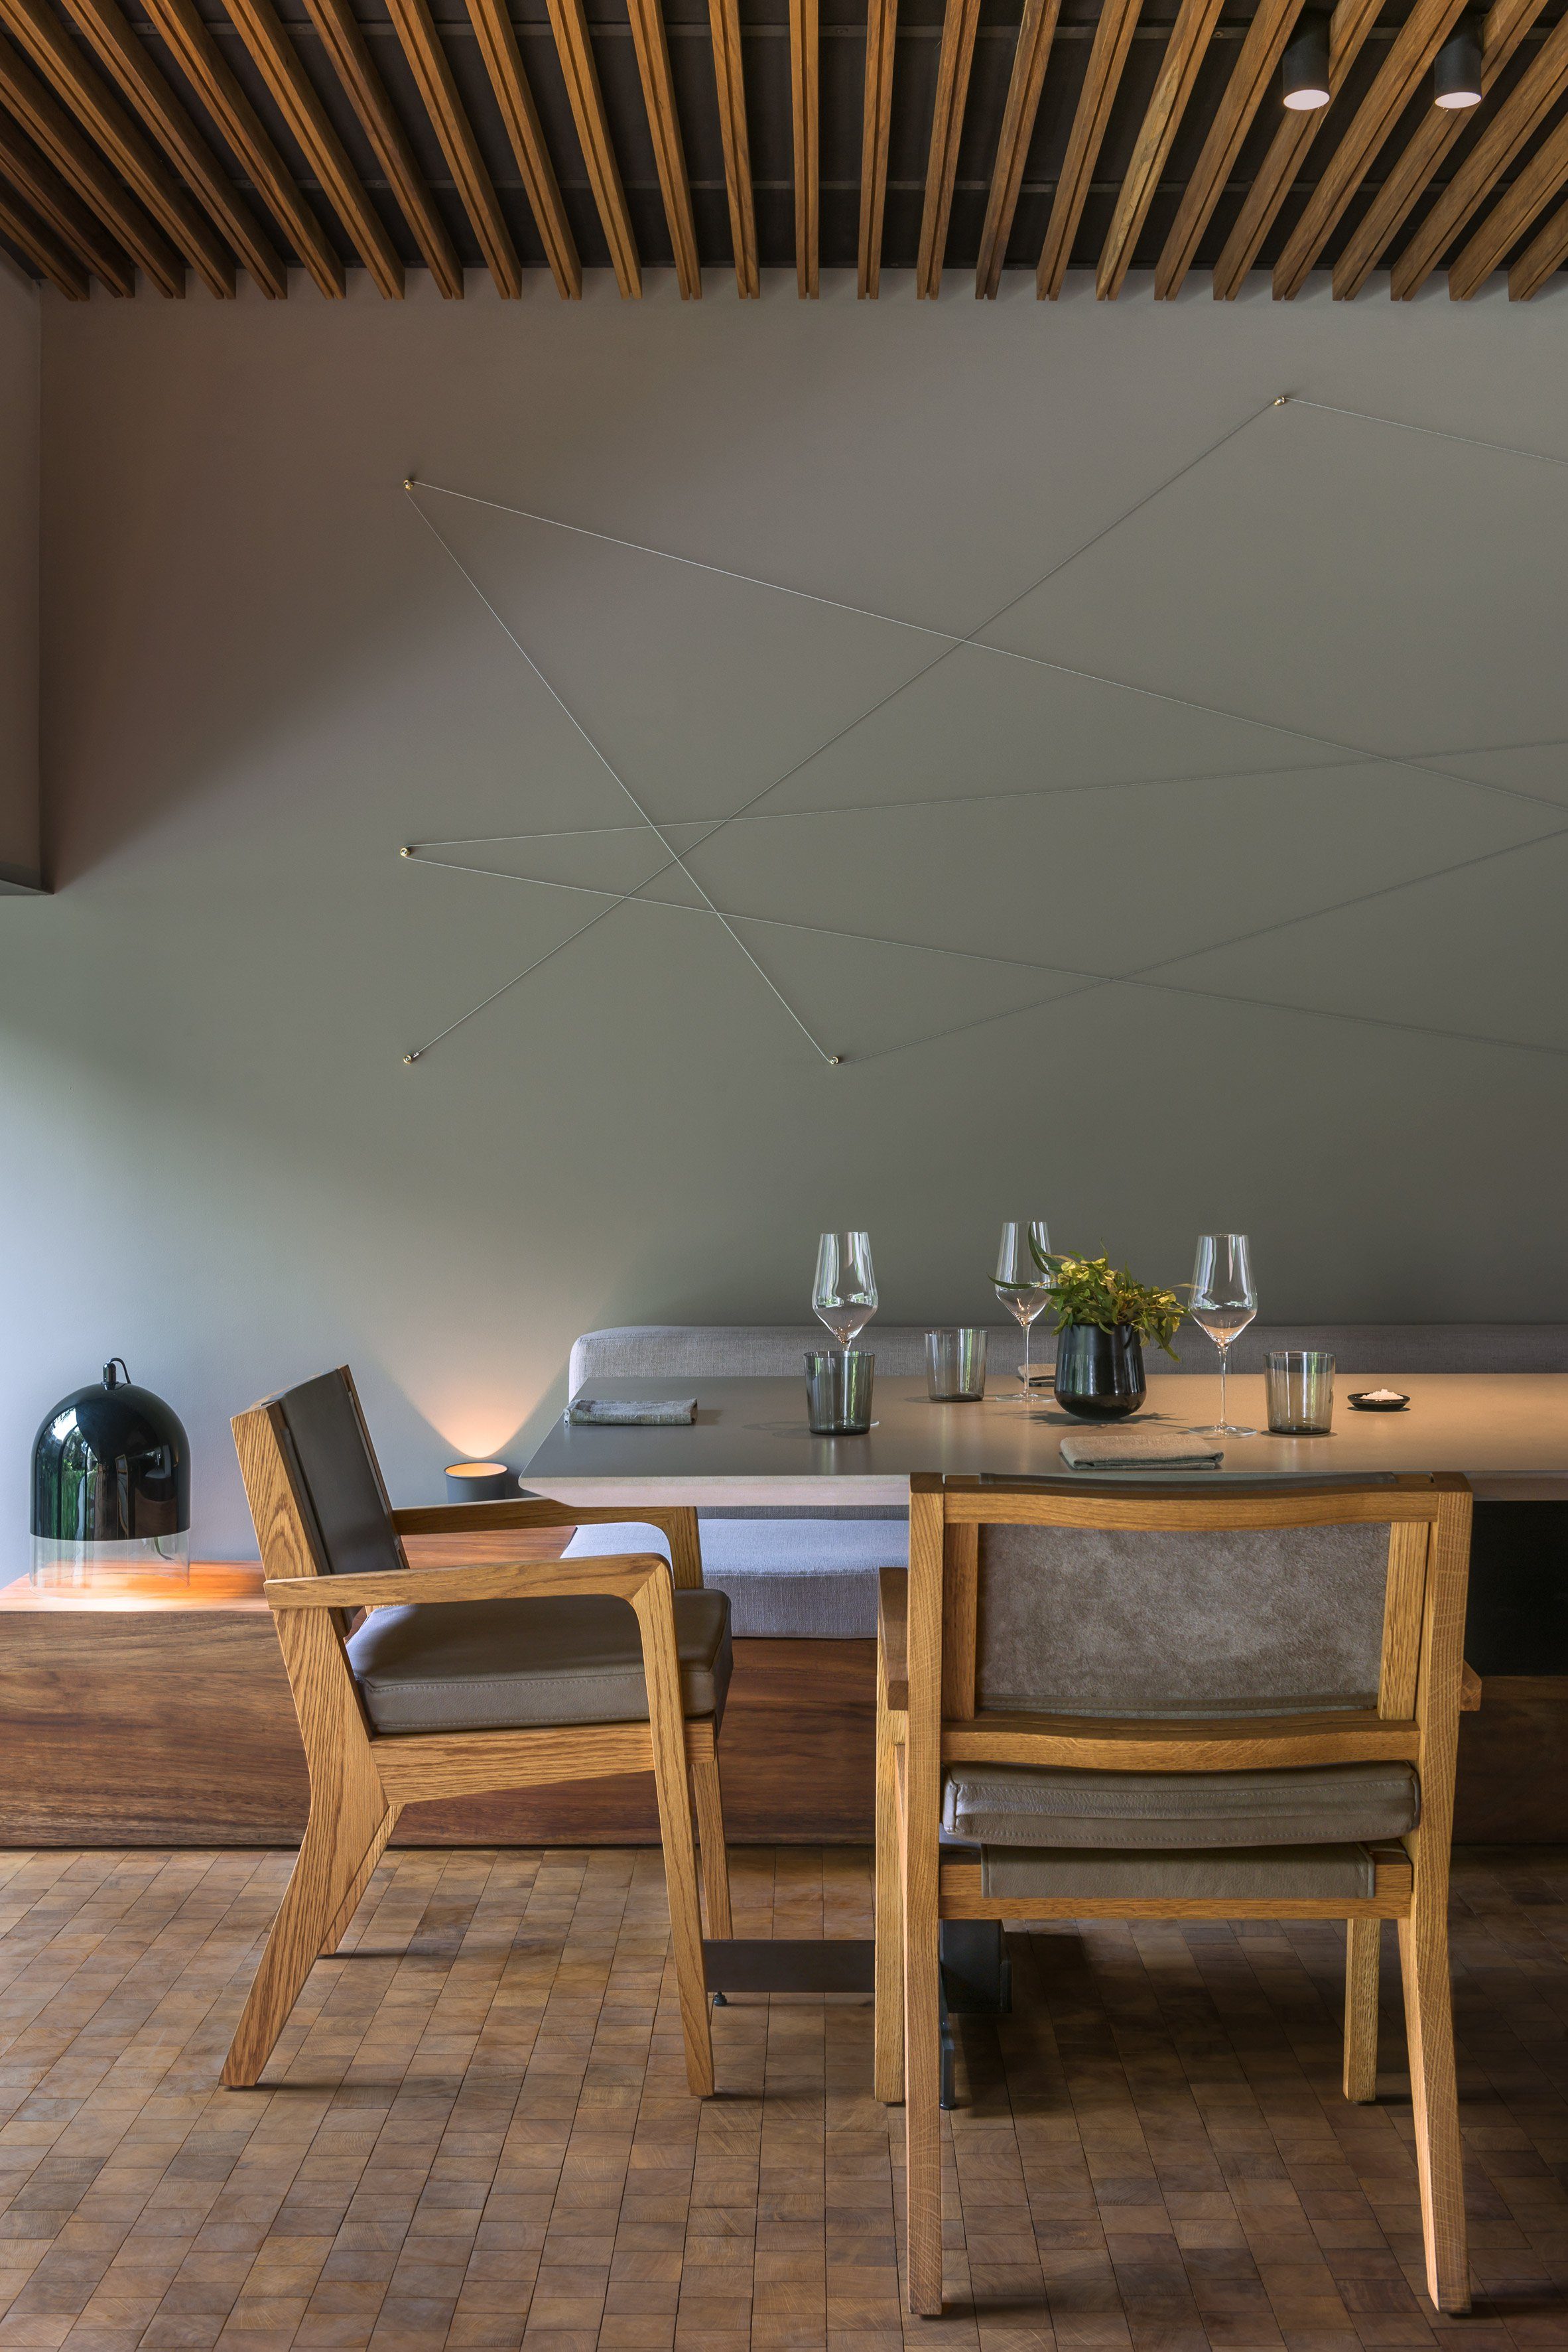 architecture-pujol-restaurant-interiors-design-studia-osnovadesign-osnova-poltava_06